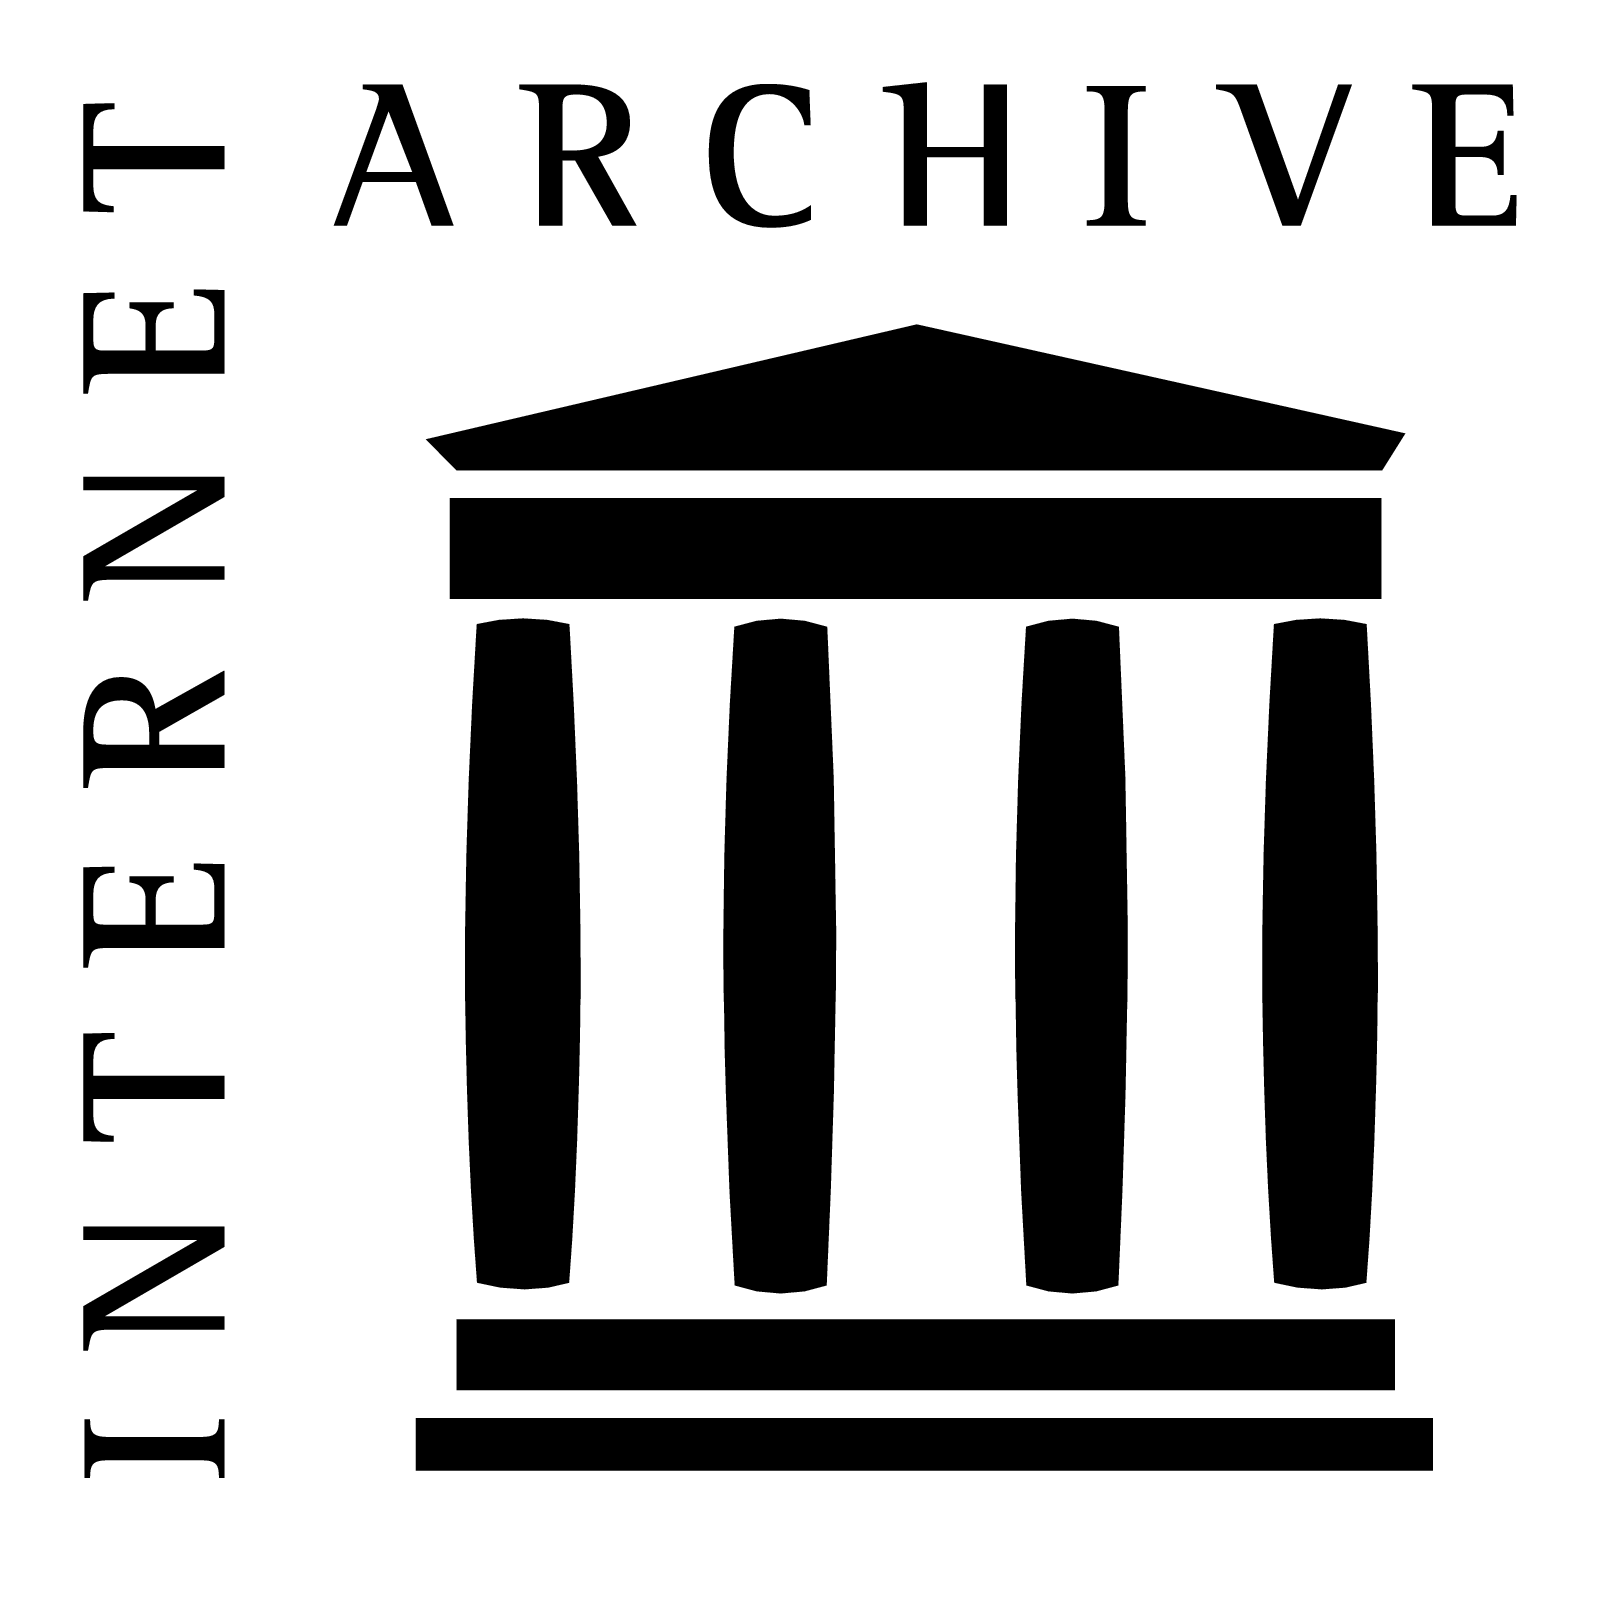 Depiction of Internet Archive